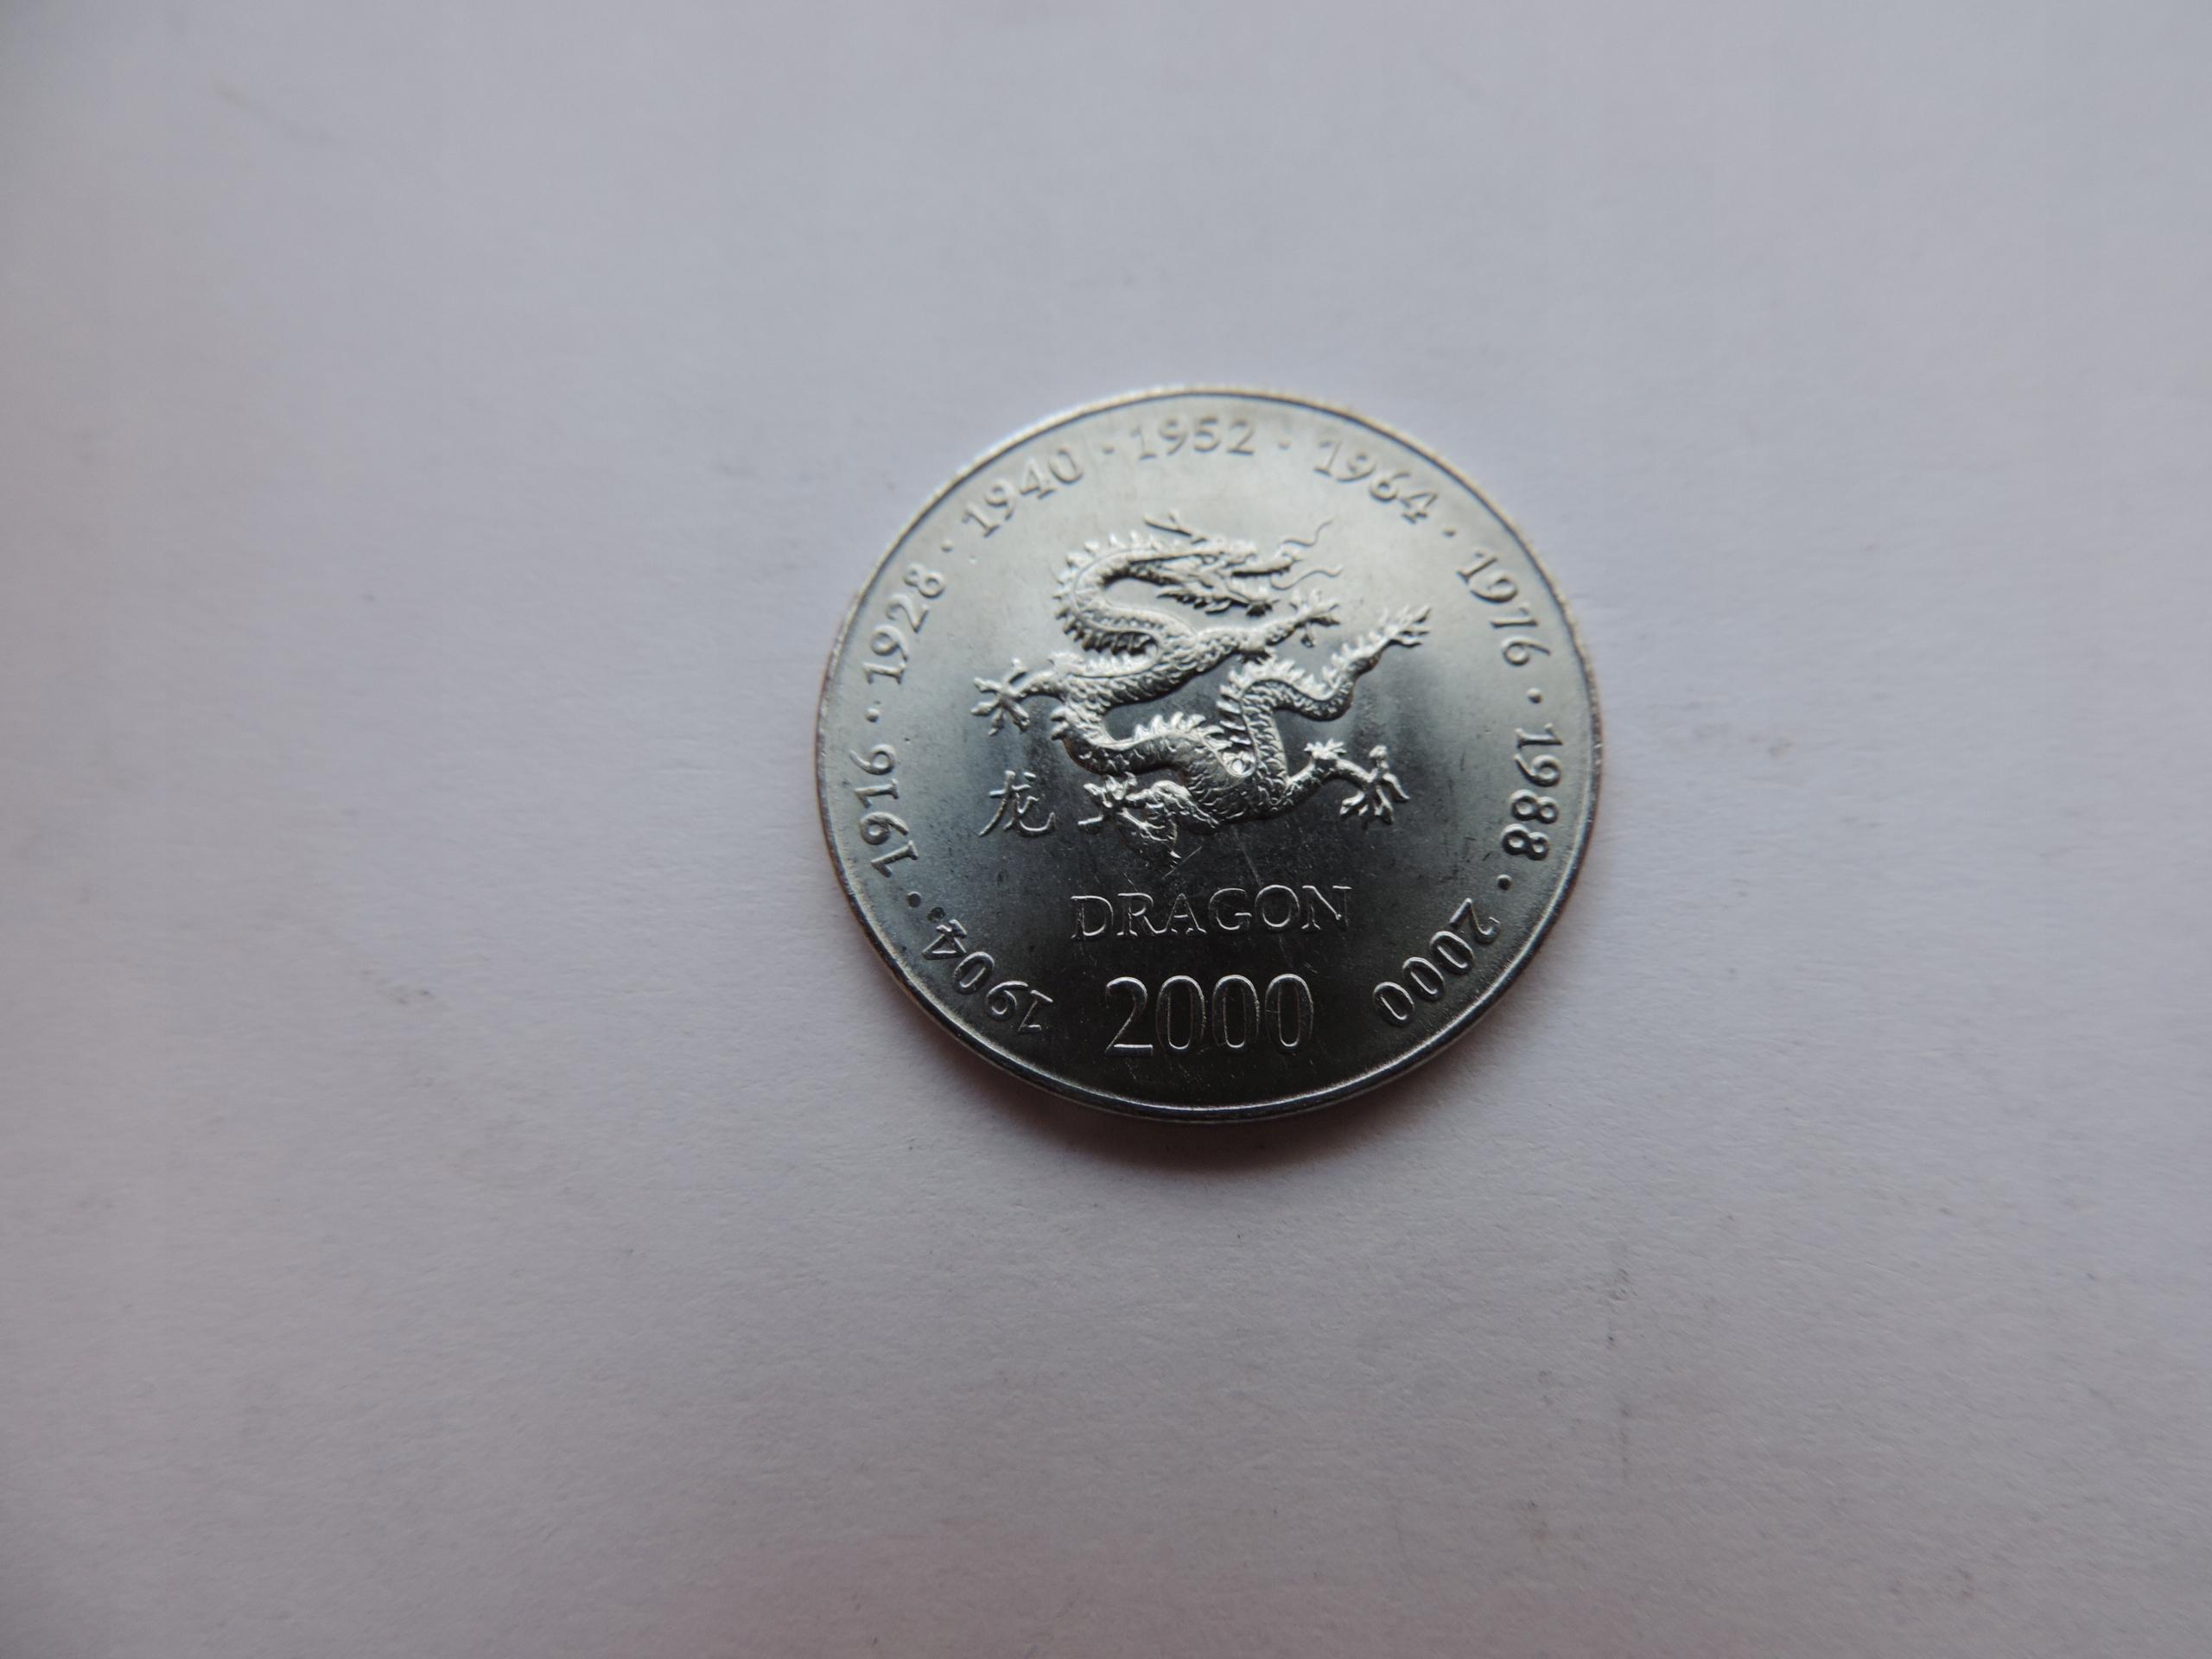 SOMALIA 10 SHILLINGS 2000 (Year of the Dragon)